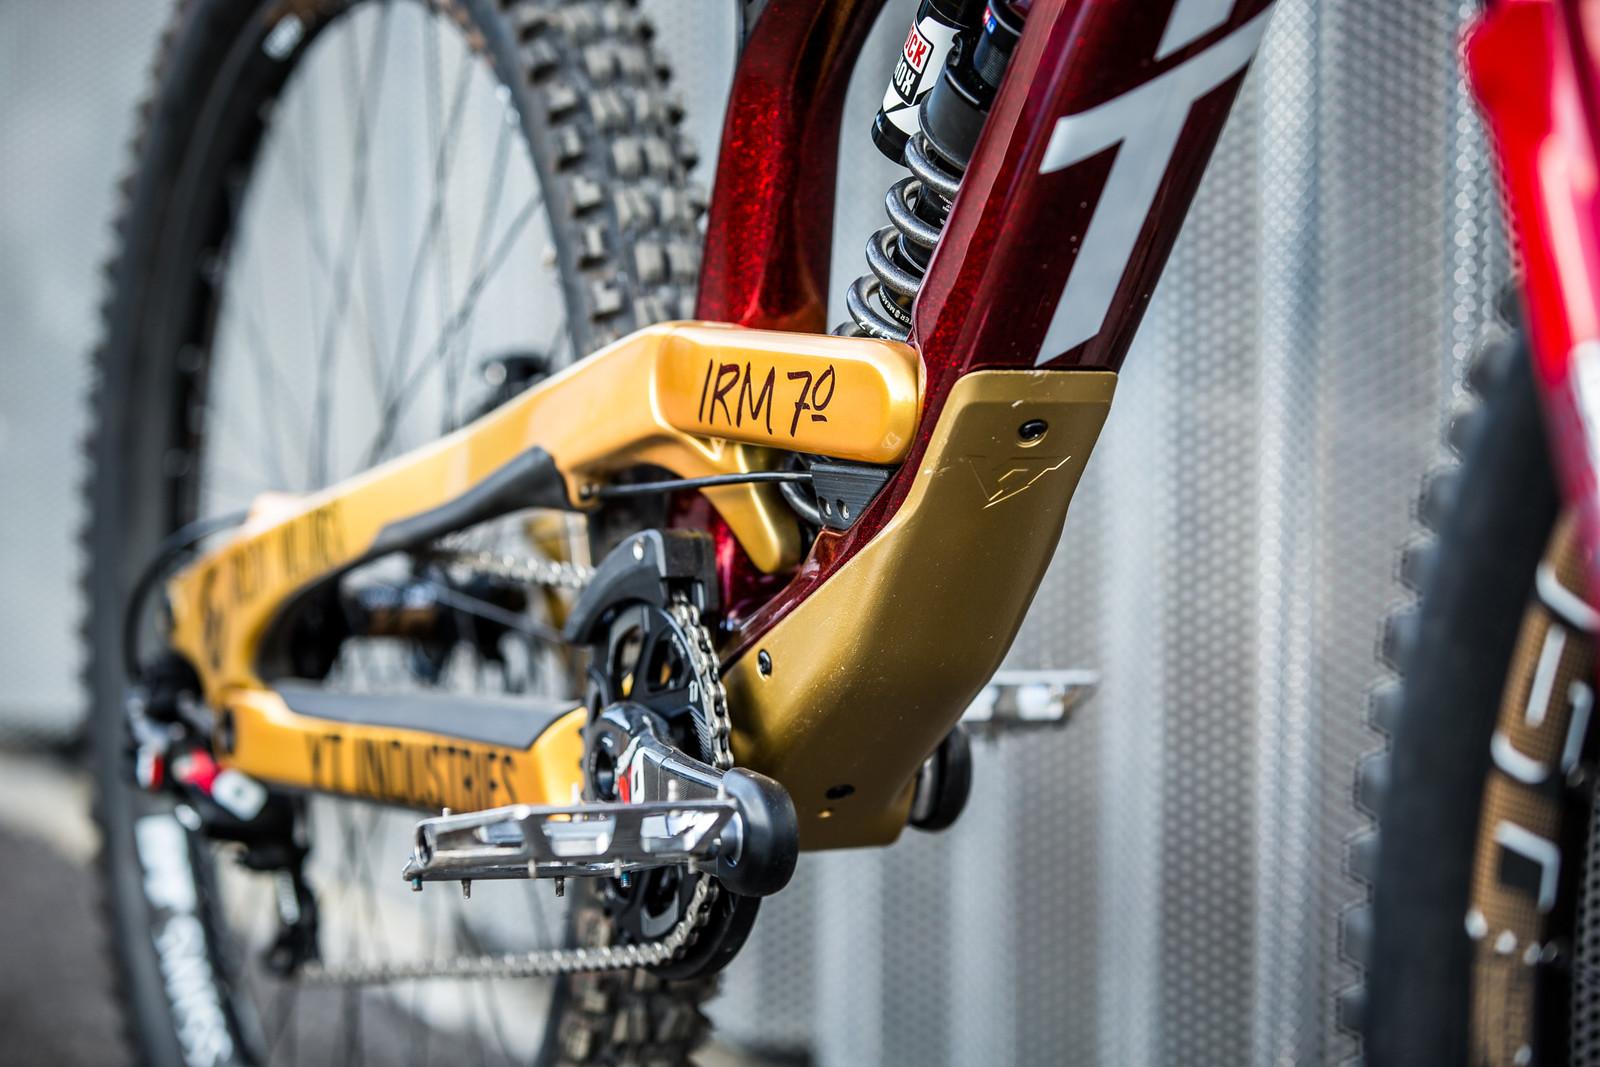 @IRM_70 - WORLD CHAMPS BIKES - Erik Irmisch's YT TUES - Mountain Biking Pictures - Vital MTB